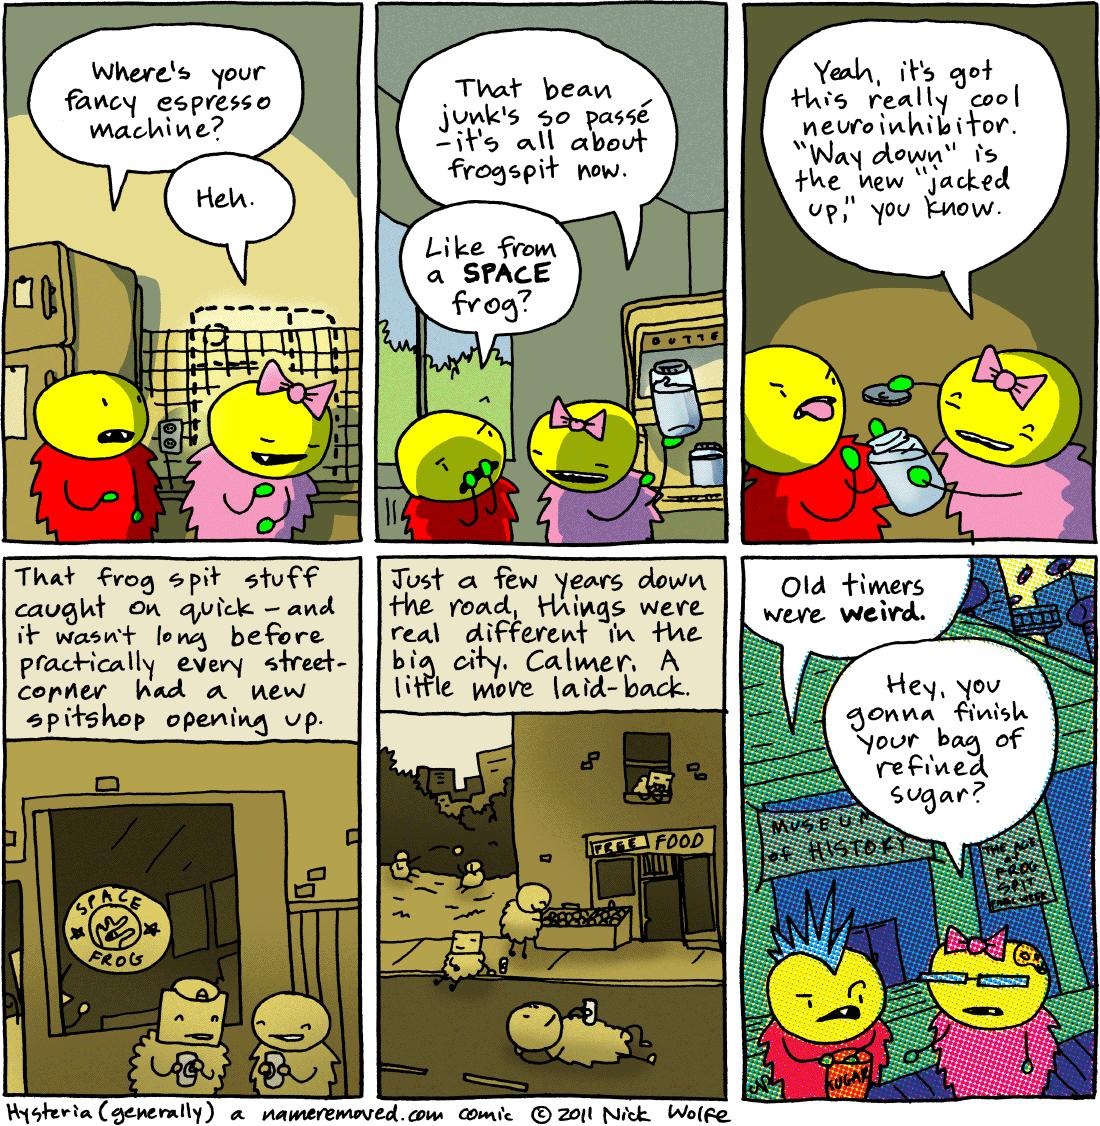 Hysteria (generally)